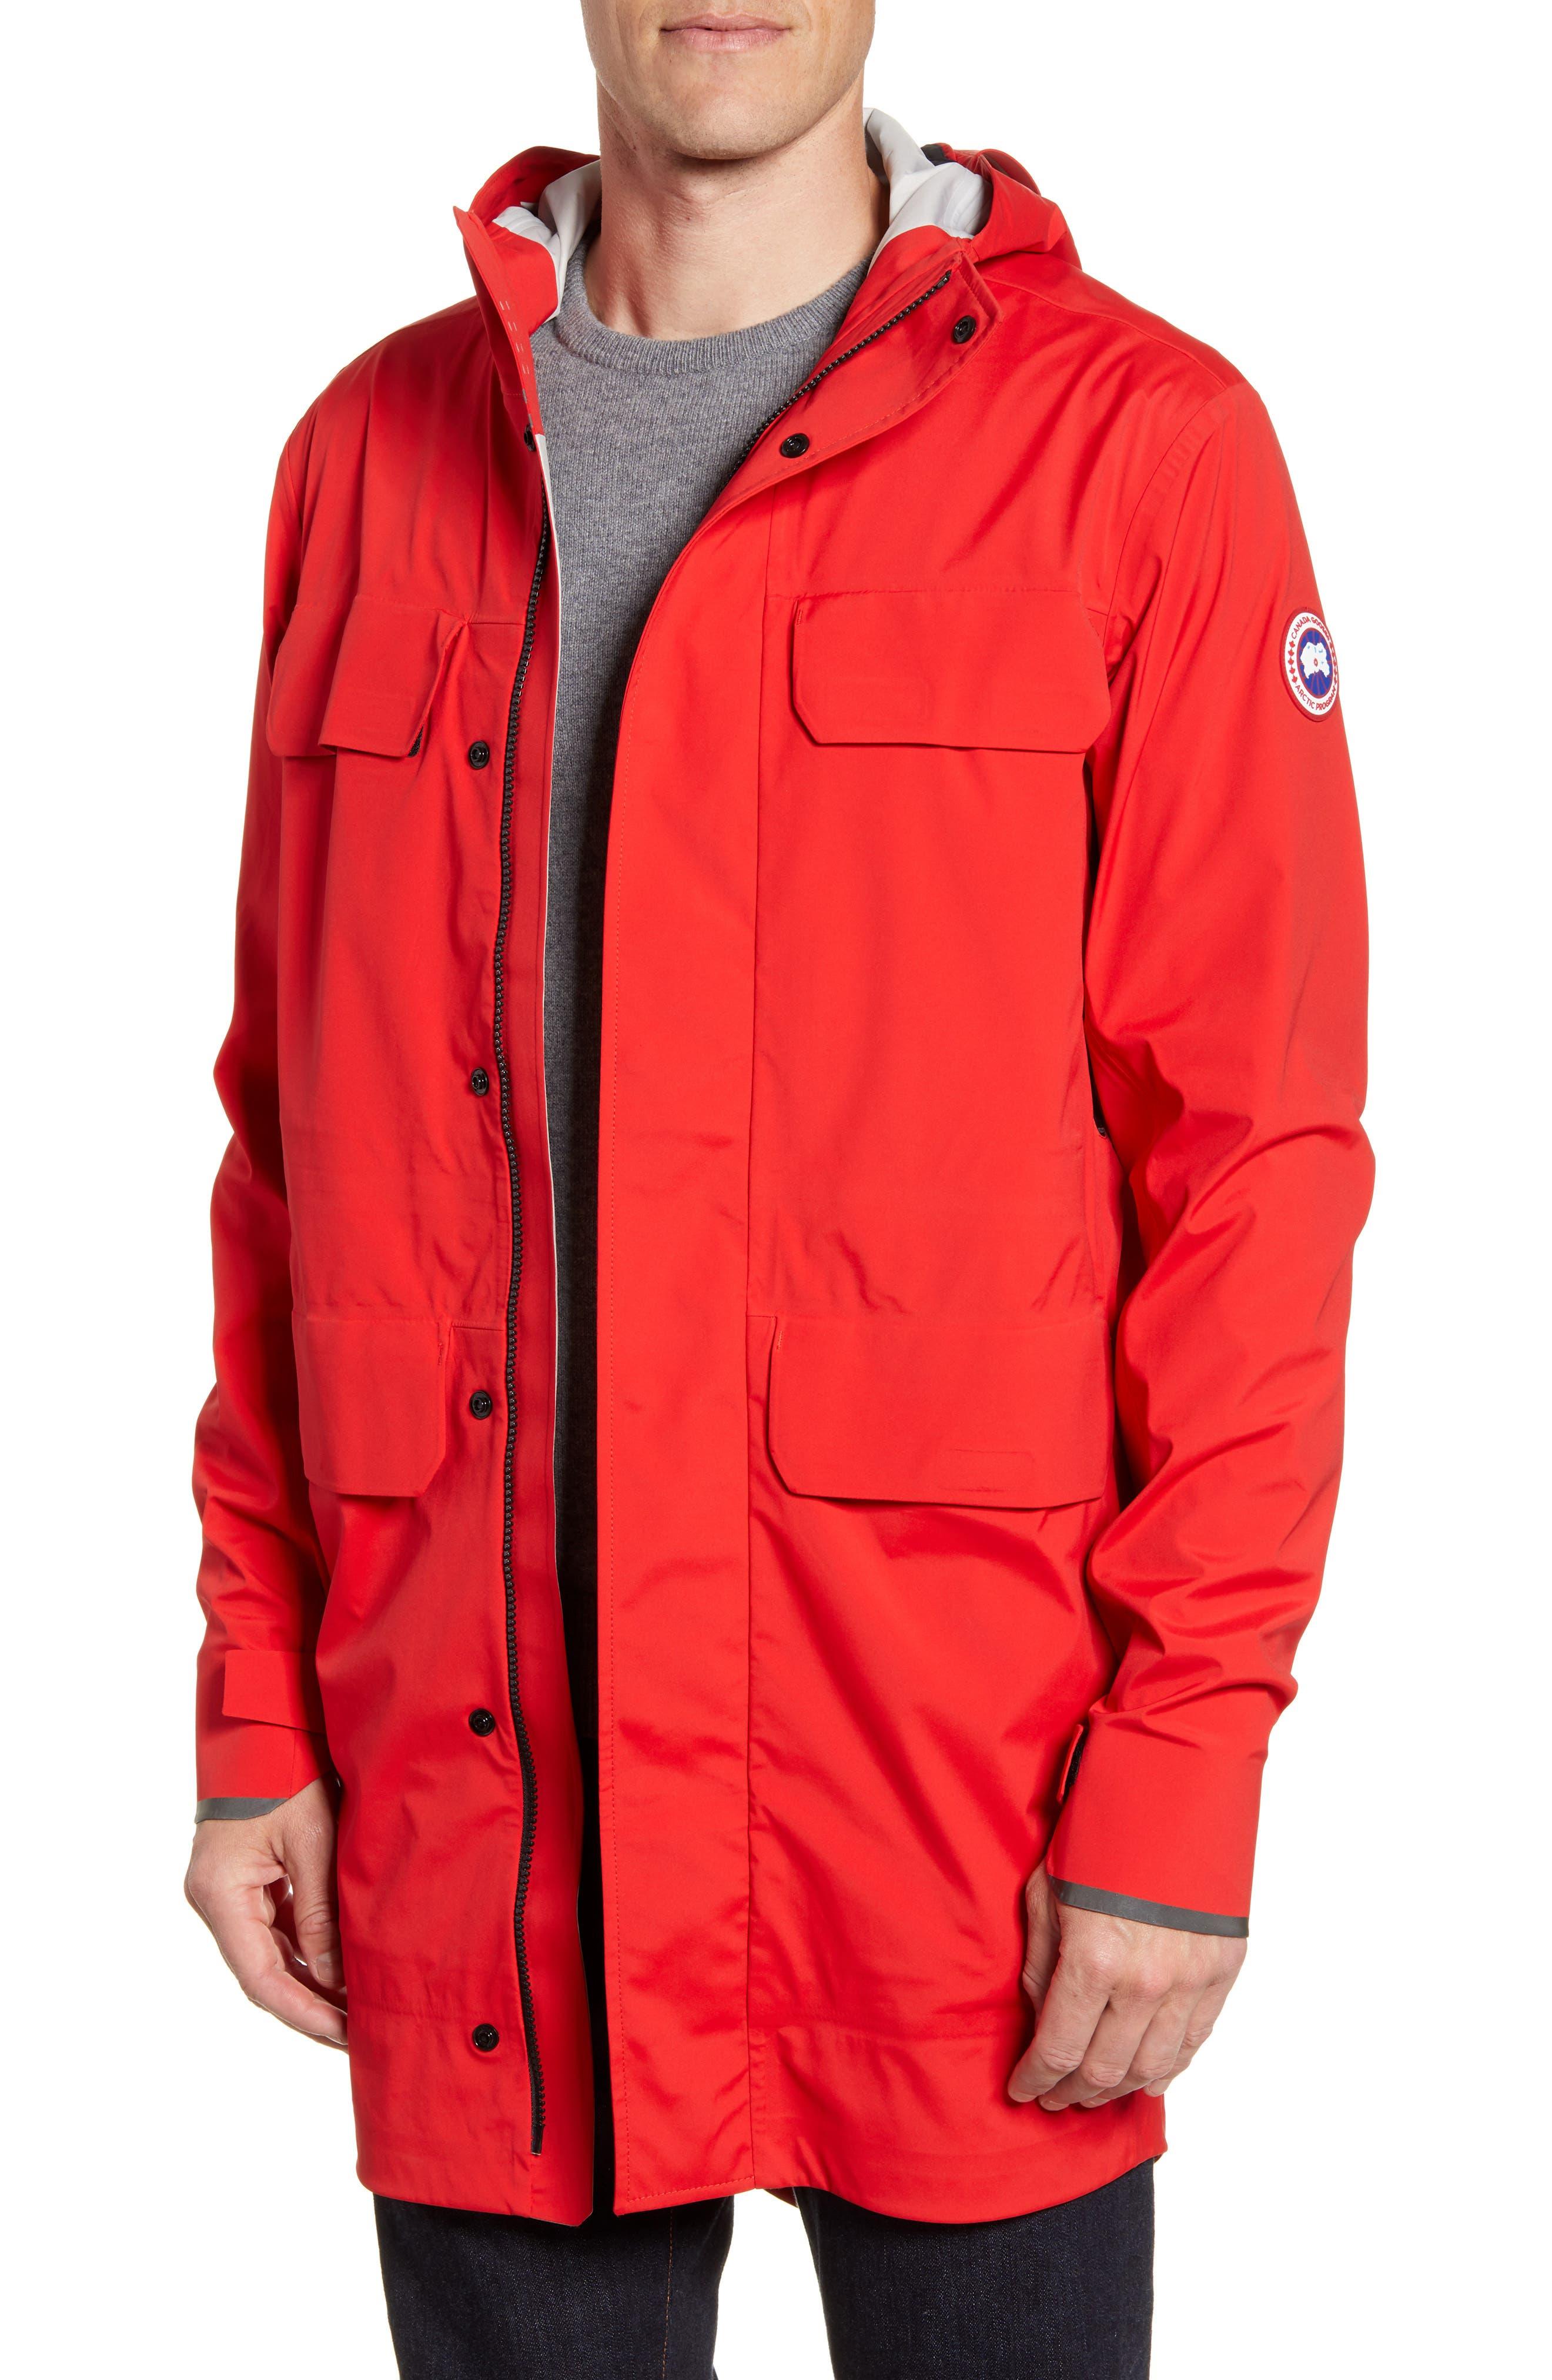 Canada Goose Seawolf Regular Fit Packable Waterproof Jacket, Red